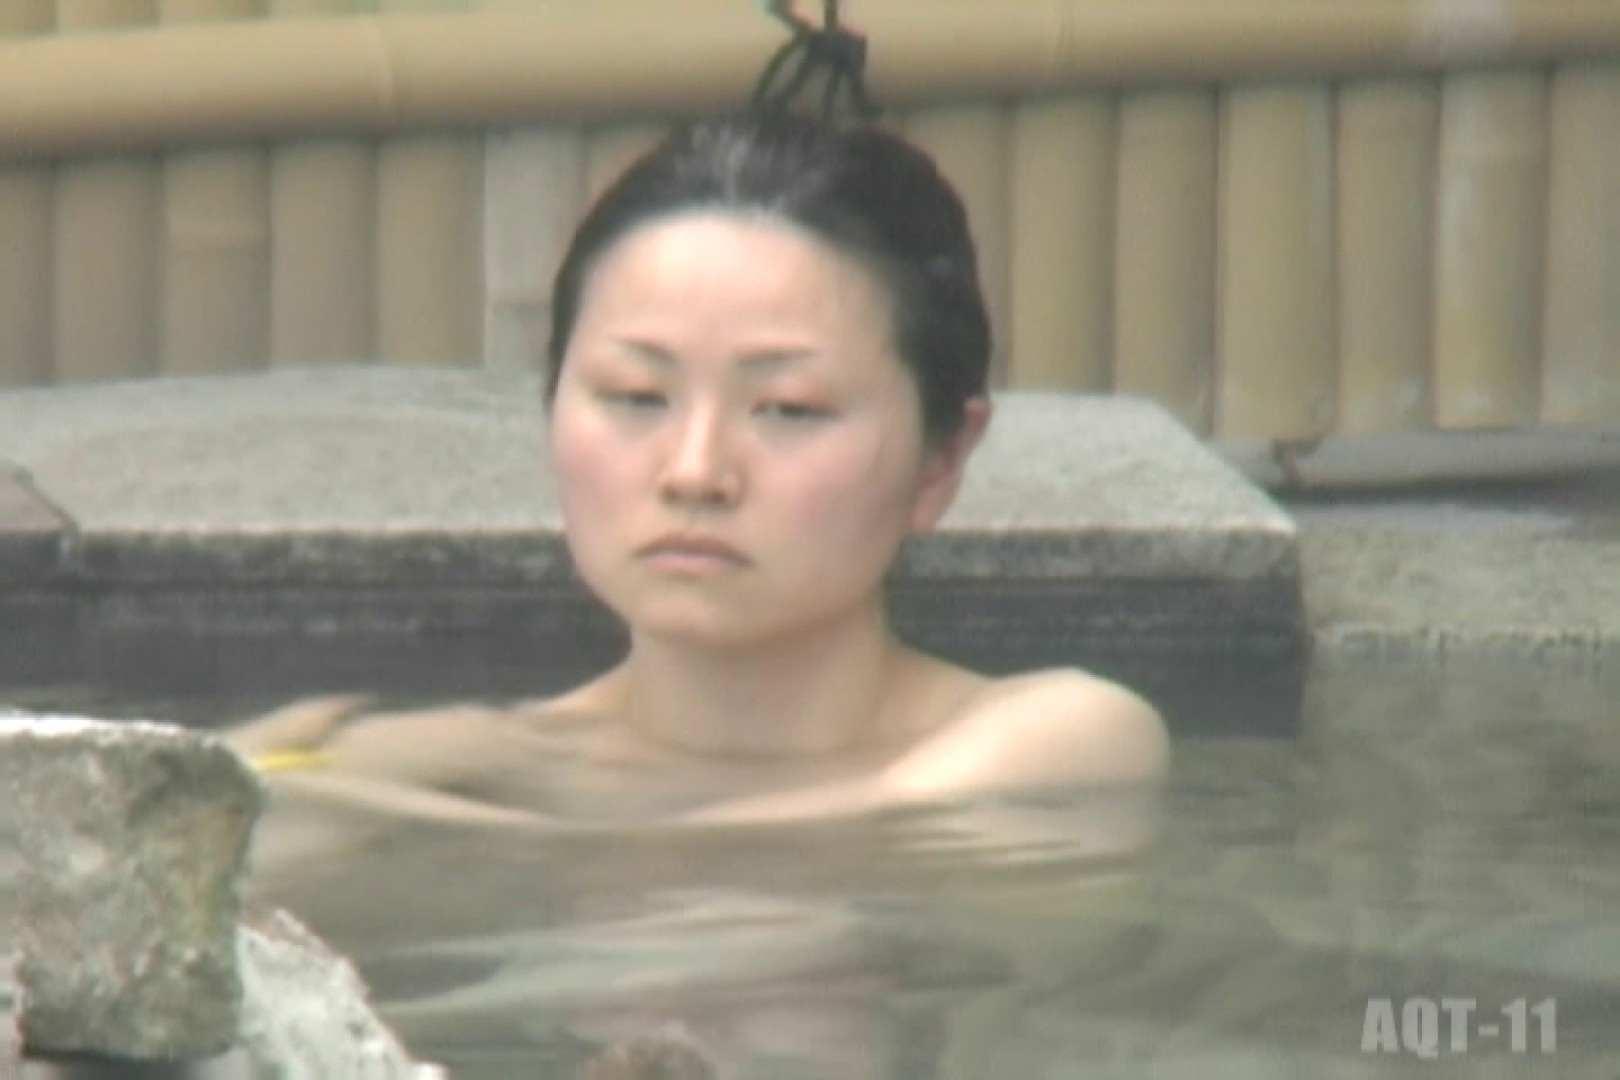 Aquaな露天風呂Vol.802 女体盗撮 盗み撮りSEX無修正画像 85連発 56